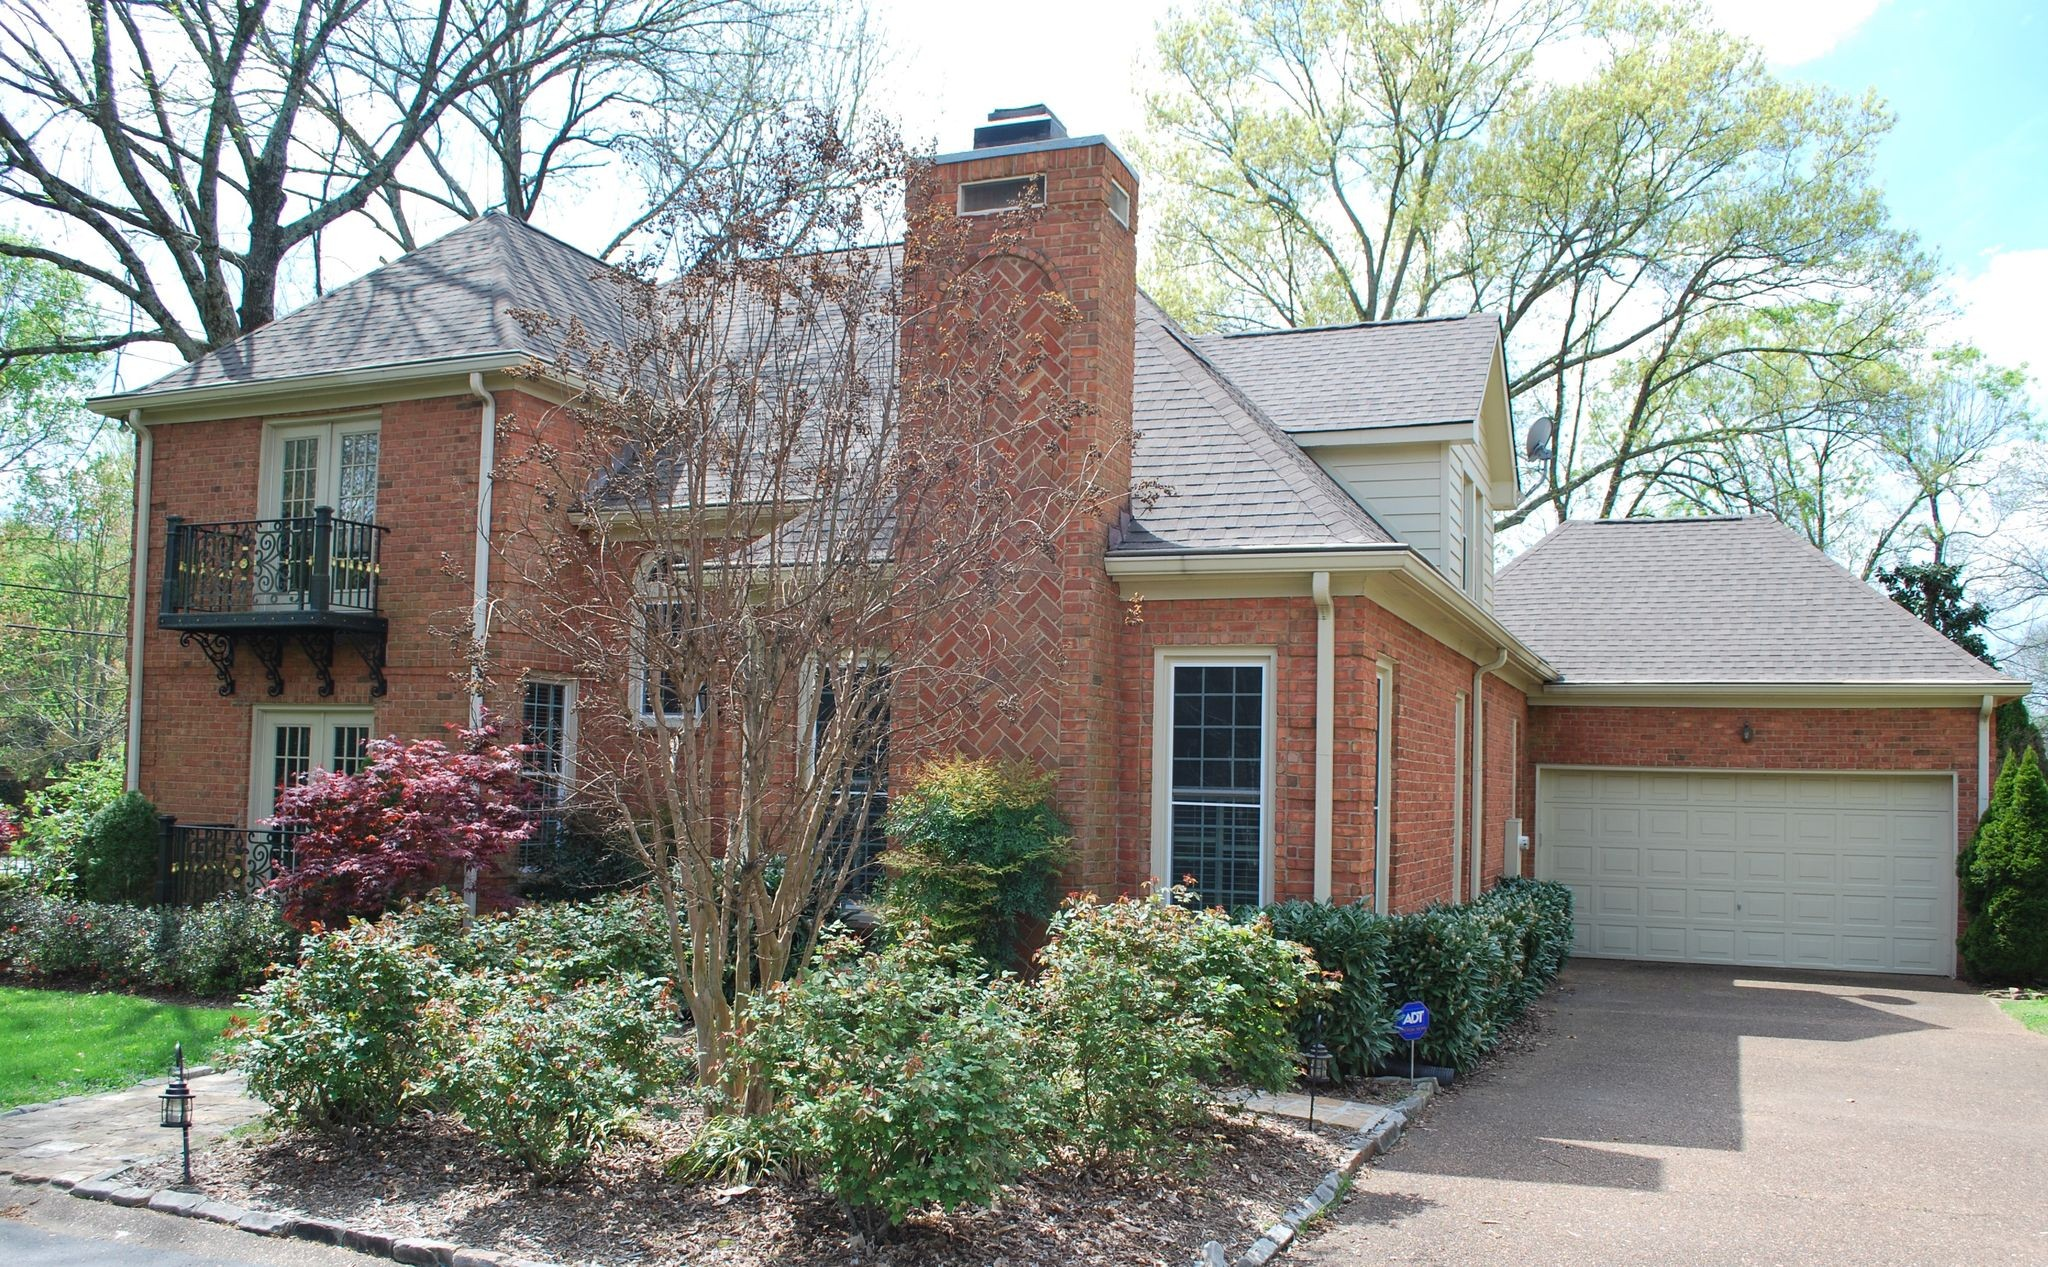 122 Wellington Park Ct, Nashville, TN 37215 - Nashville, TN real estate listing